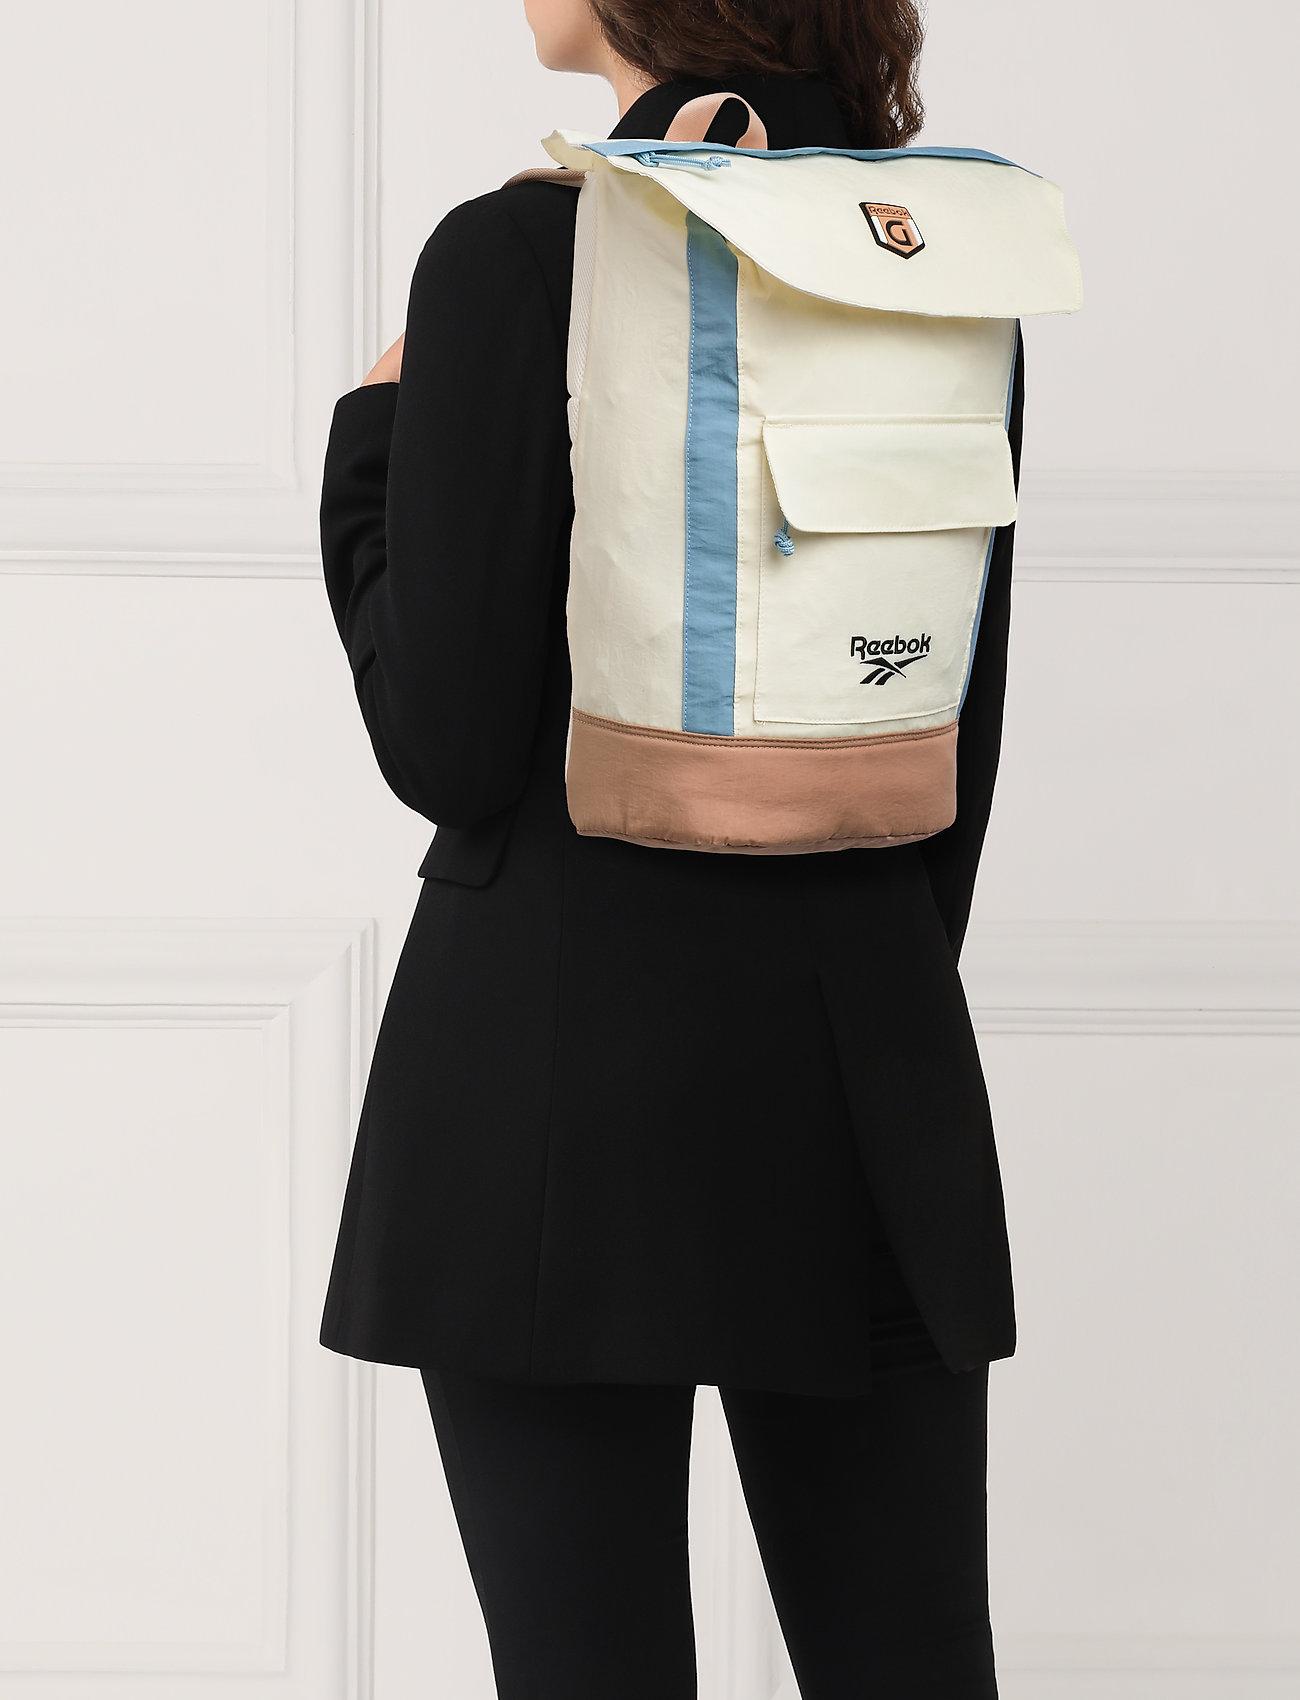 Reebok Classics CL Gigi Hadid Sling Bag - CHALK